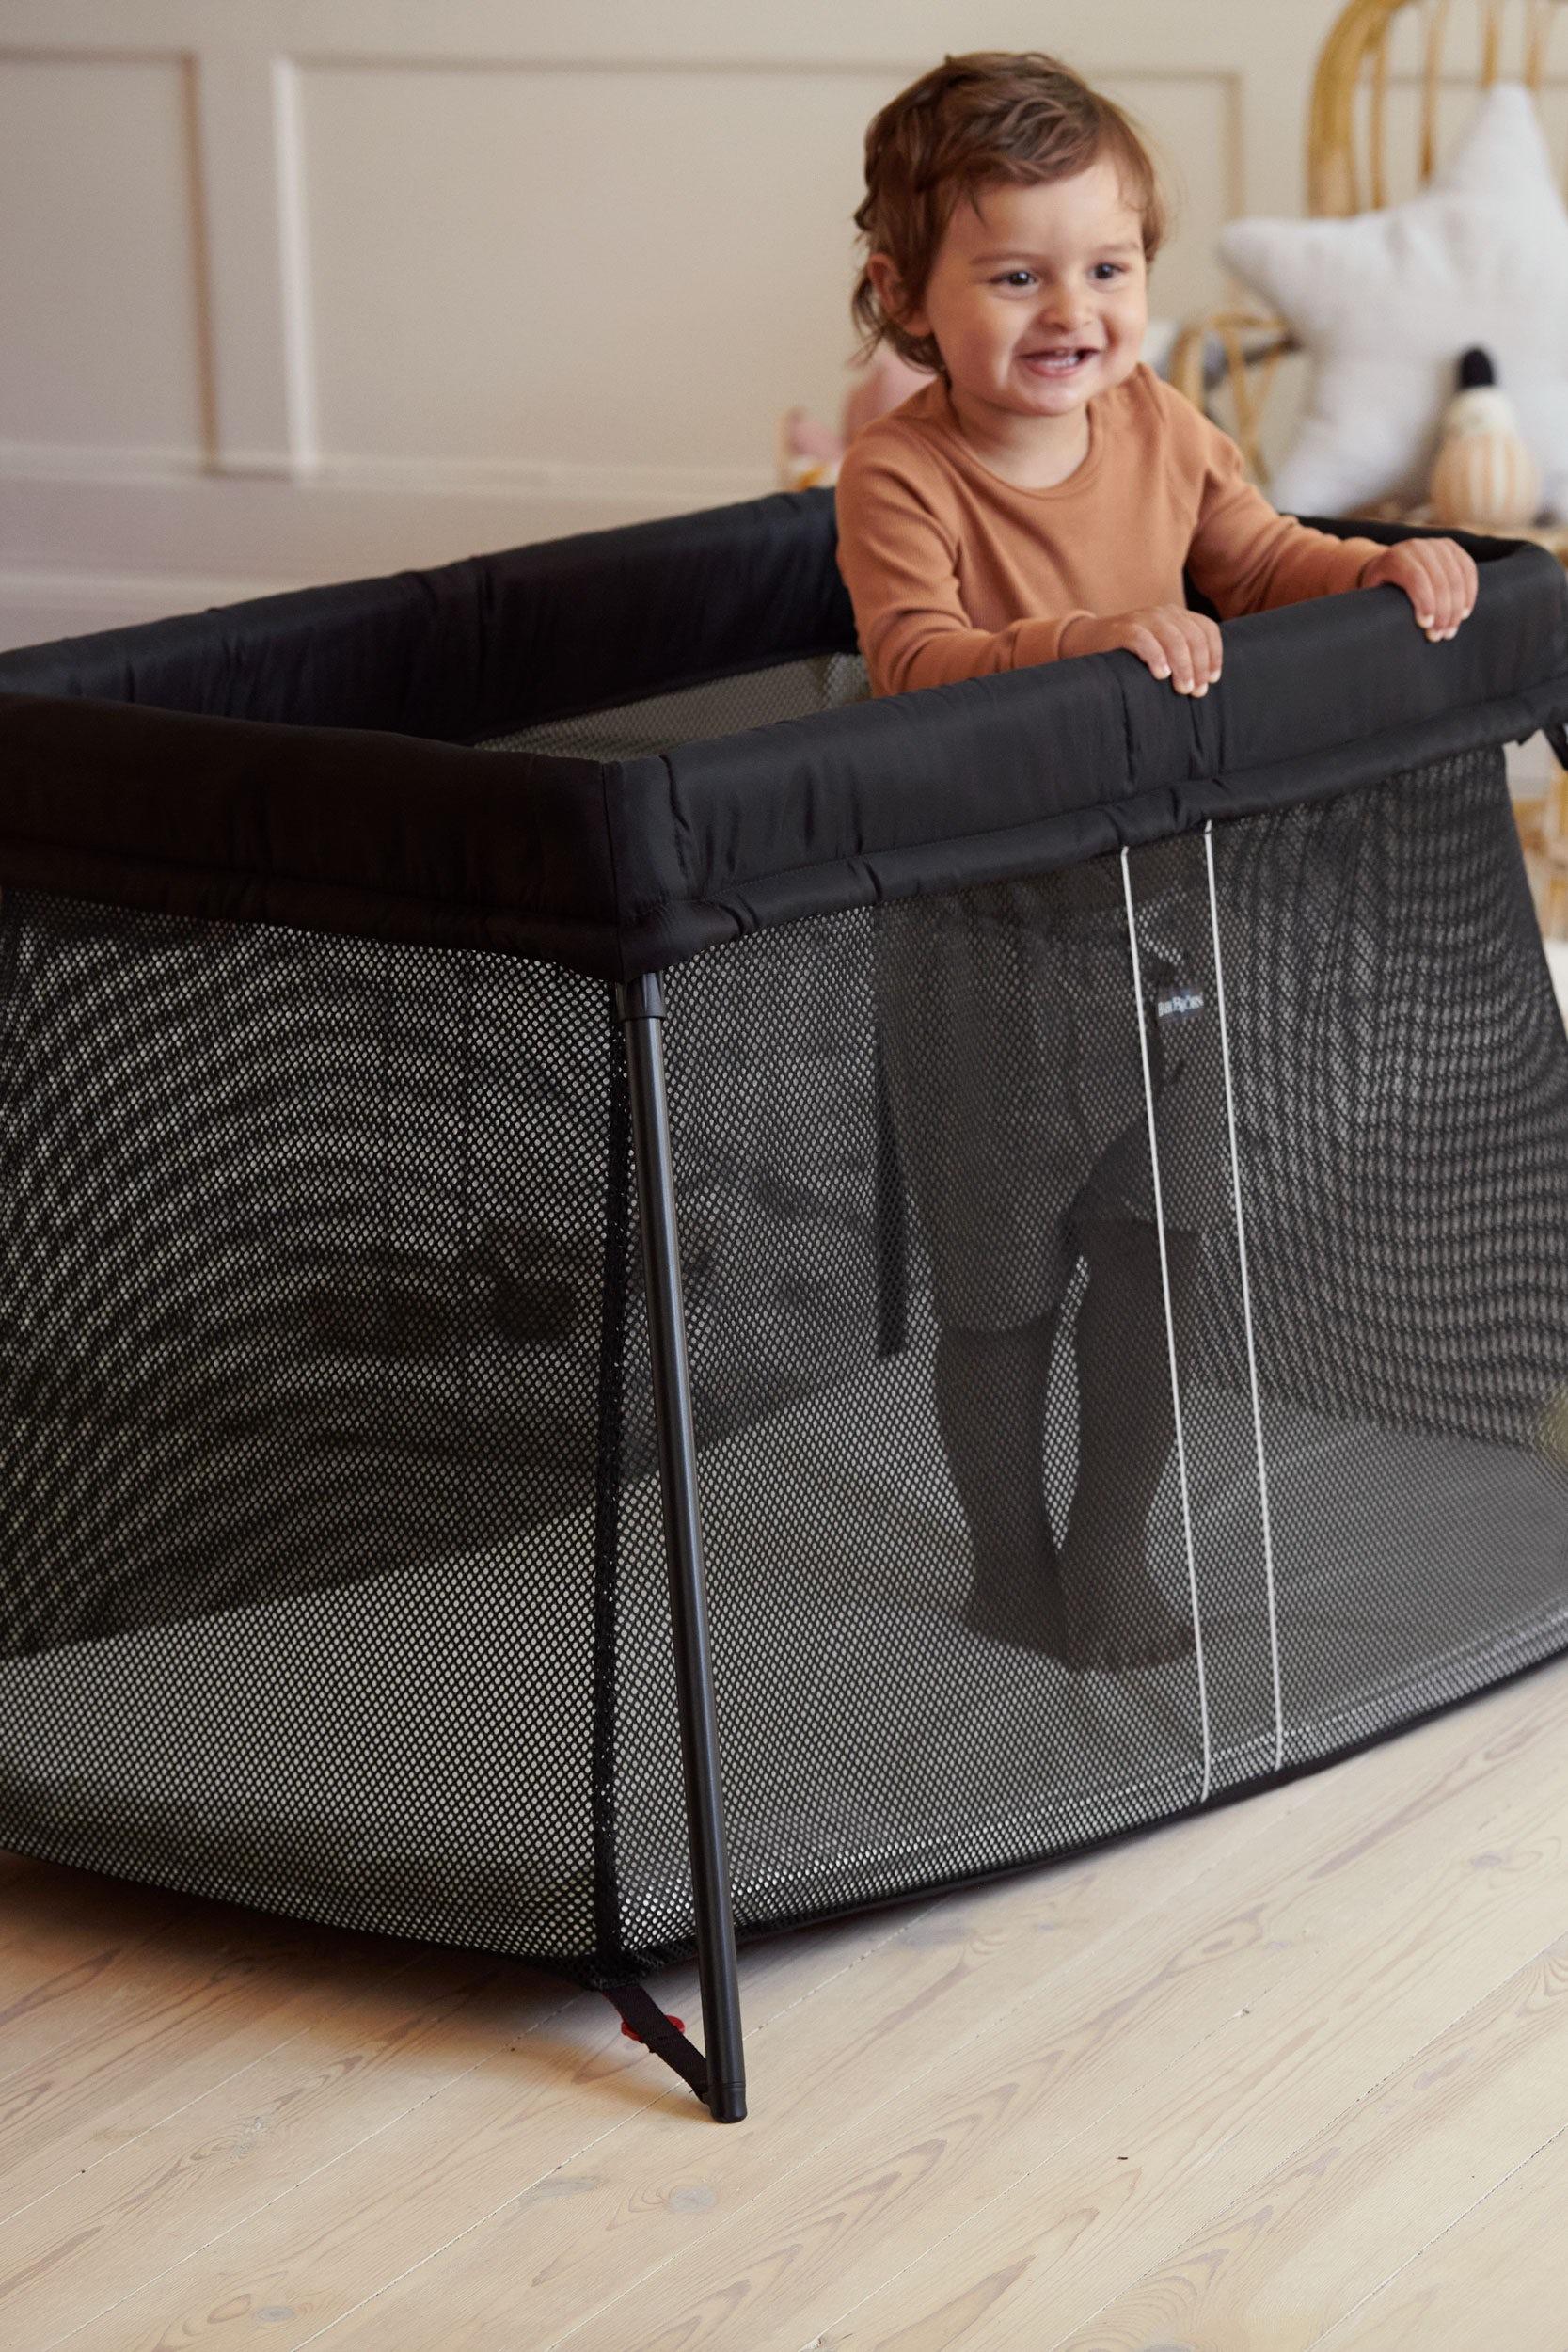 Travel Crib Light Perfect At Home Away Babybjorn